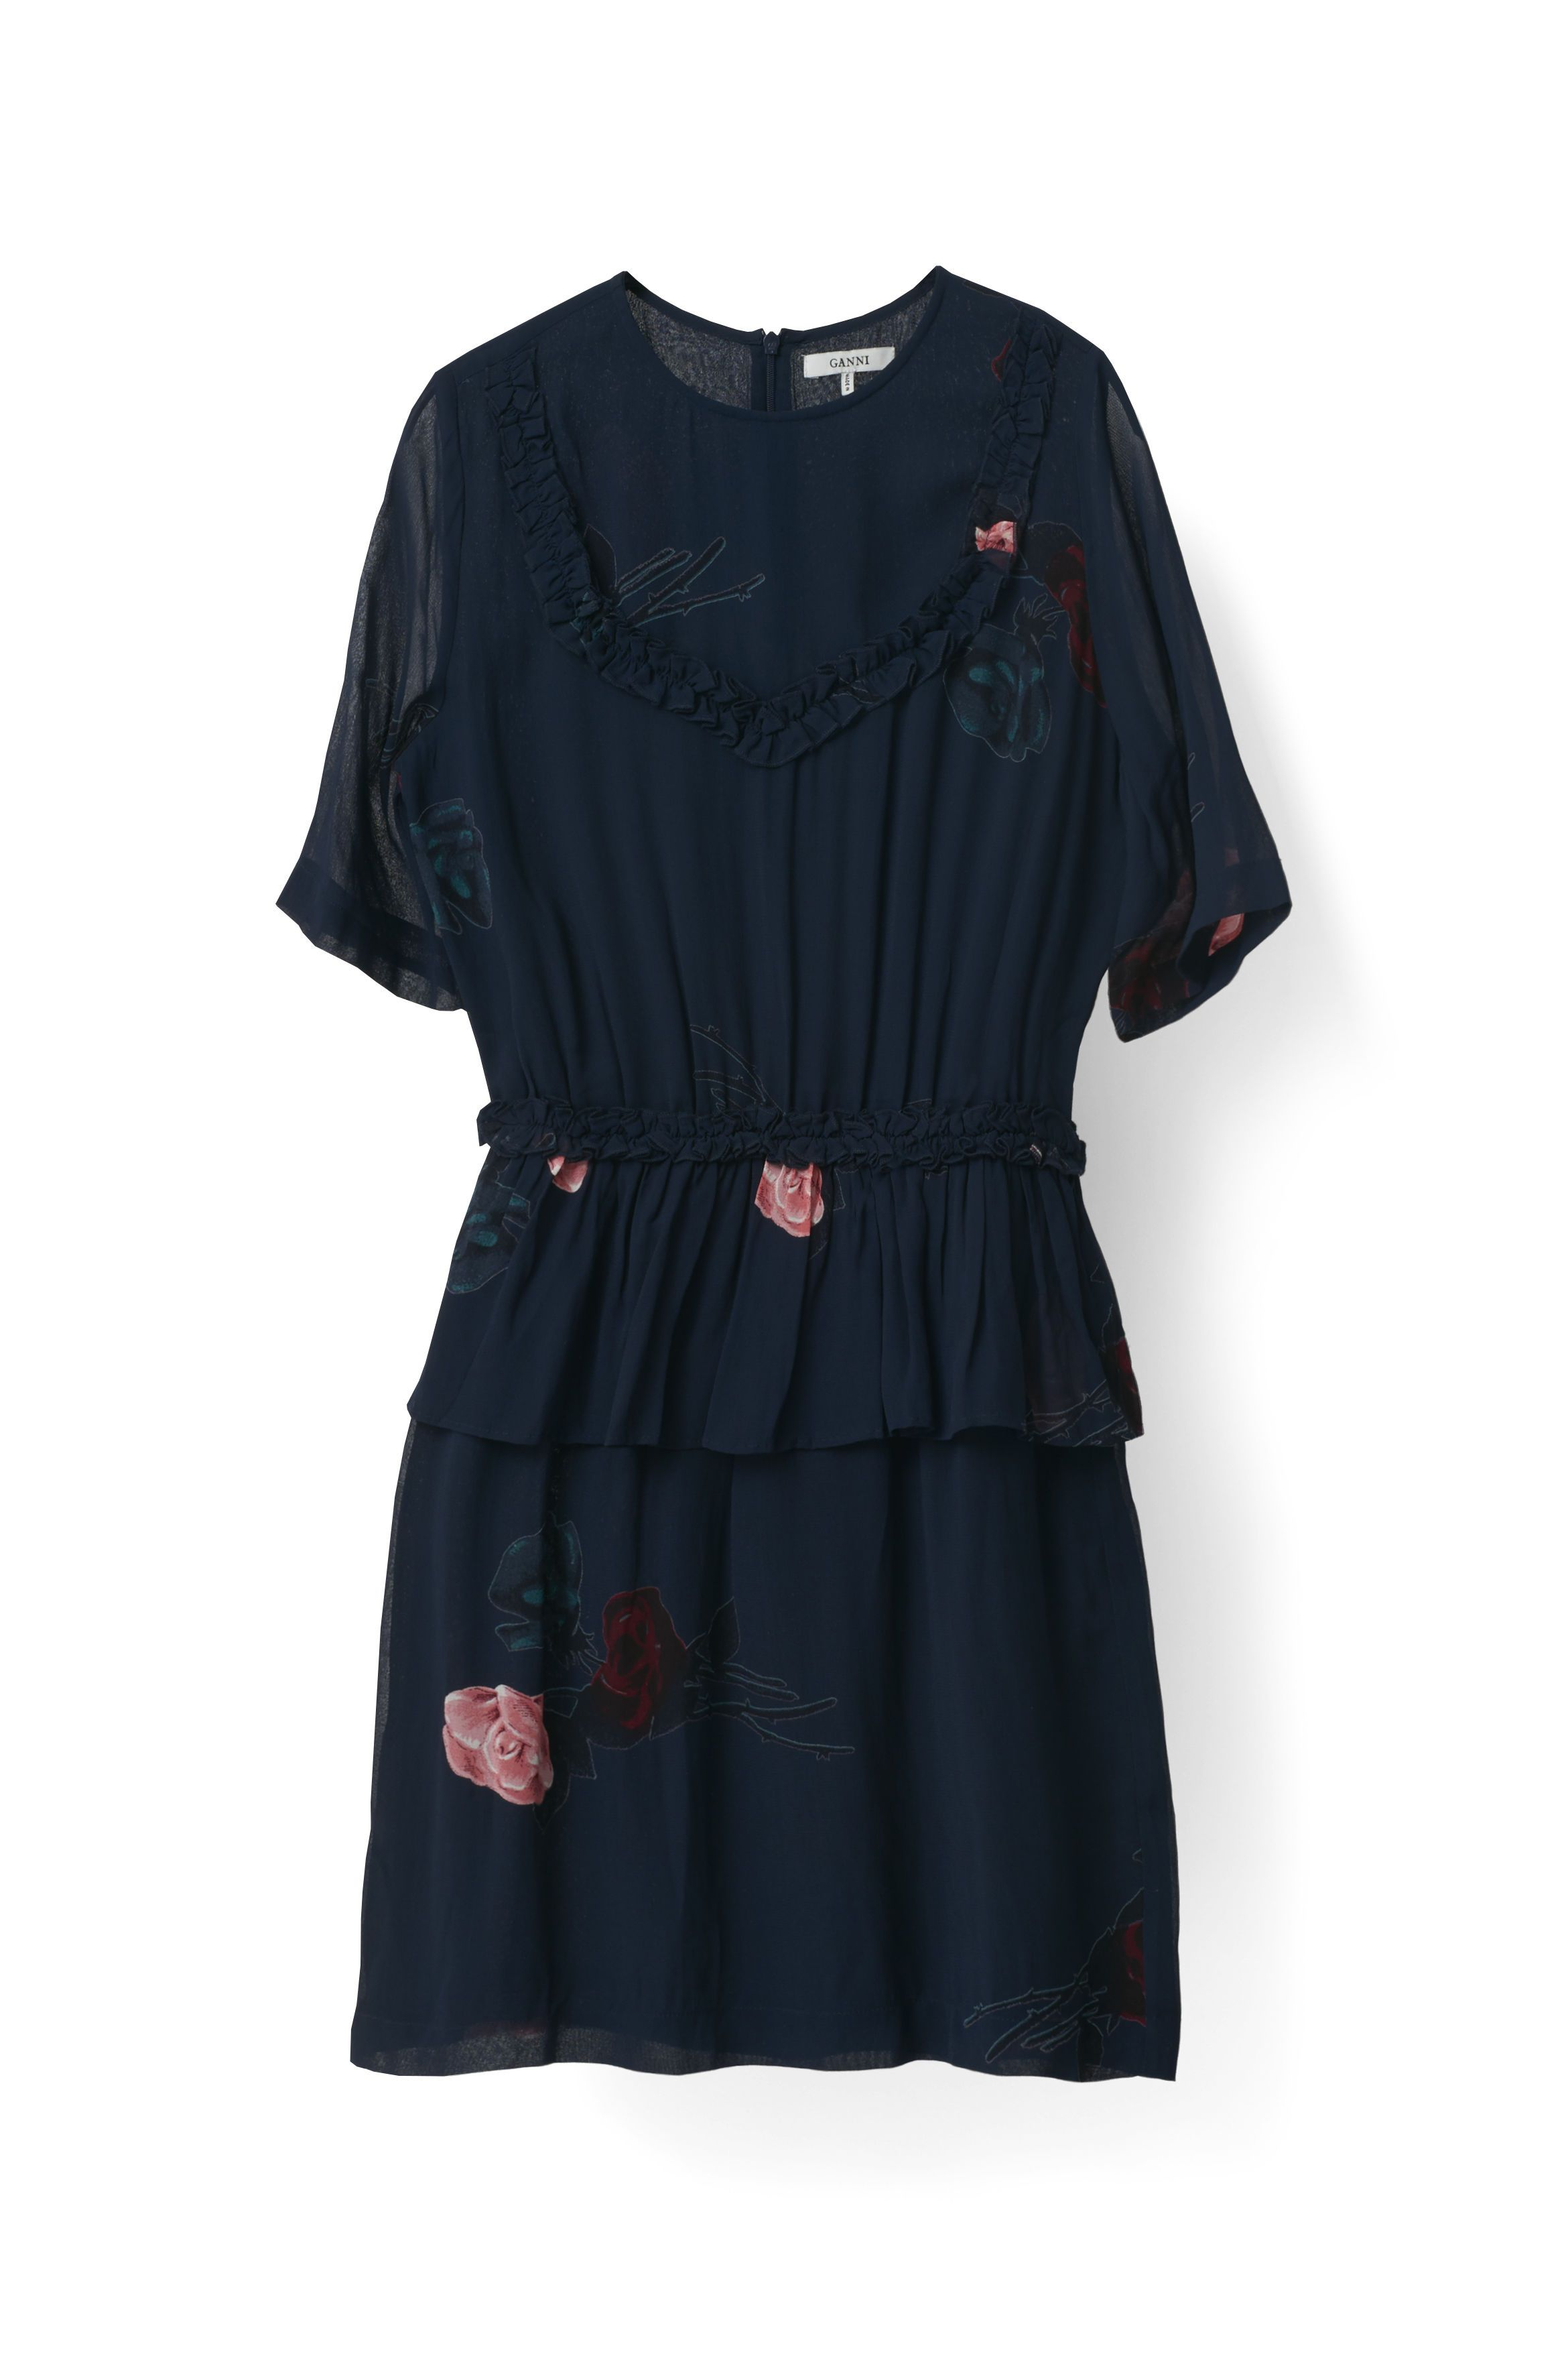 bc2f65a762a5 Dean Georgette Dress - Ganni